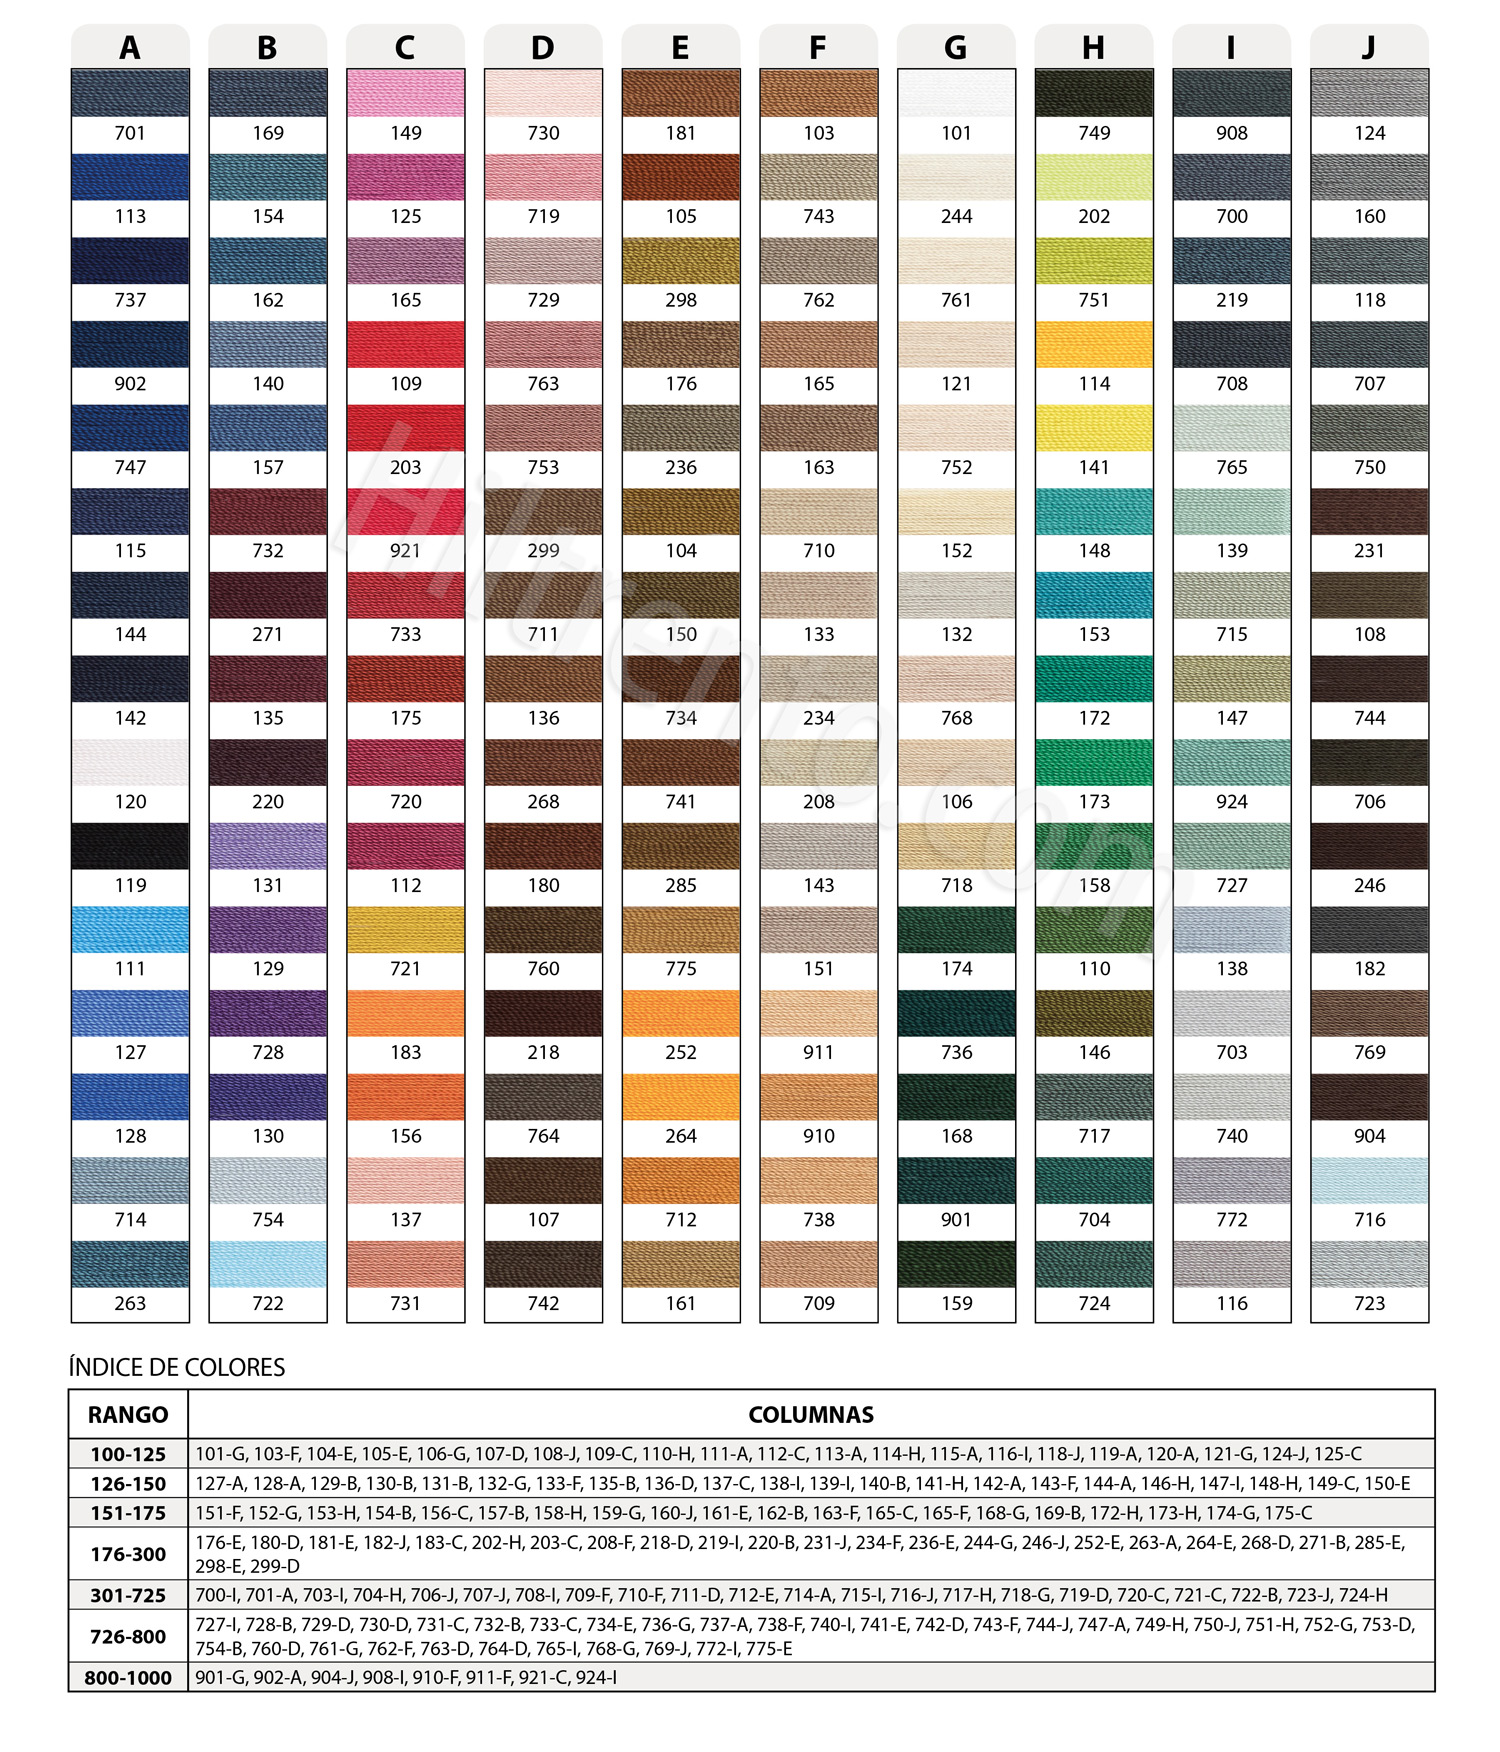 carta colores hilo poliester